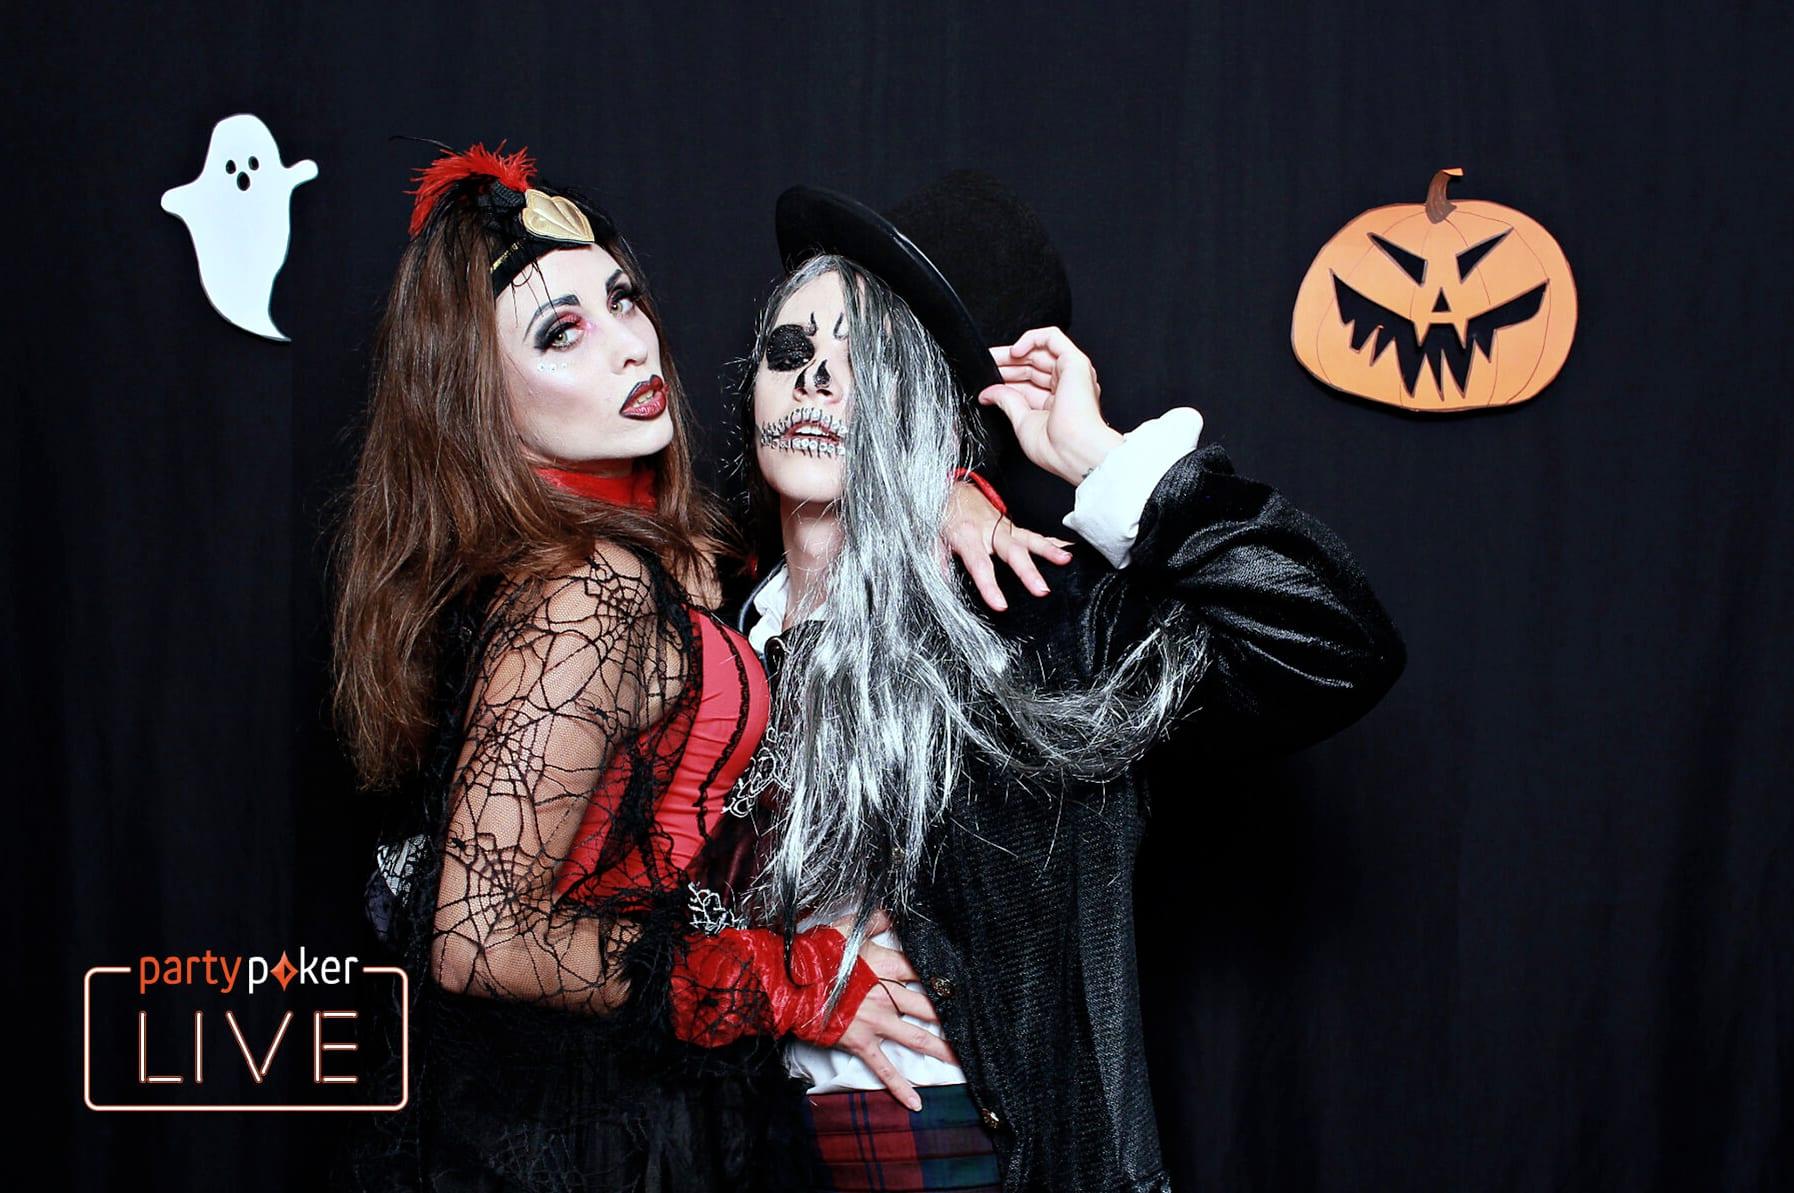 fotokoutek-partypoker-29-10-2018-514853